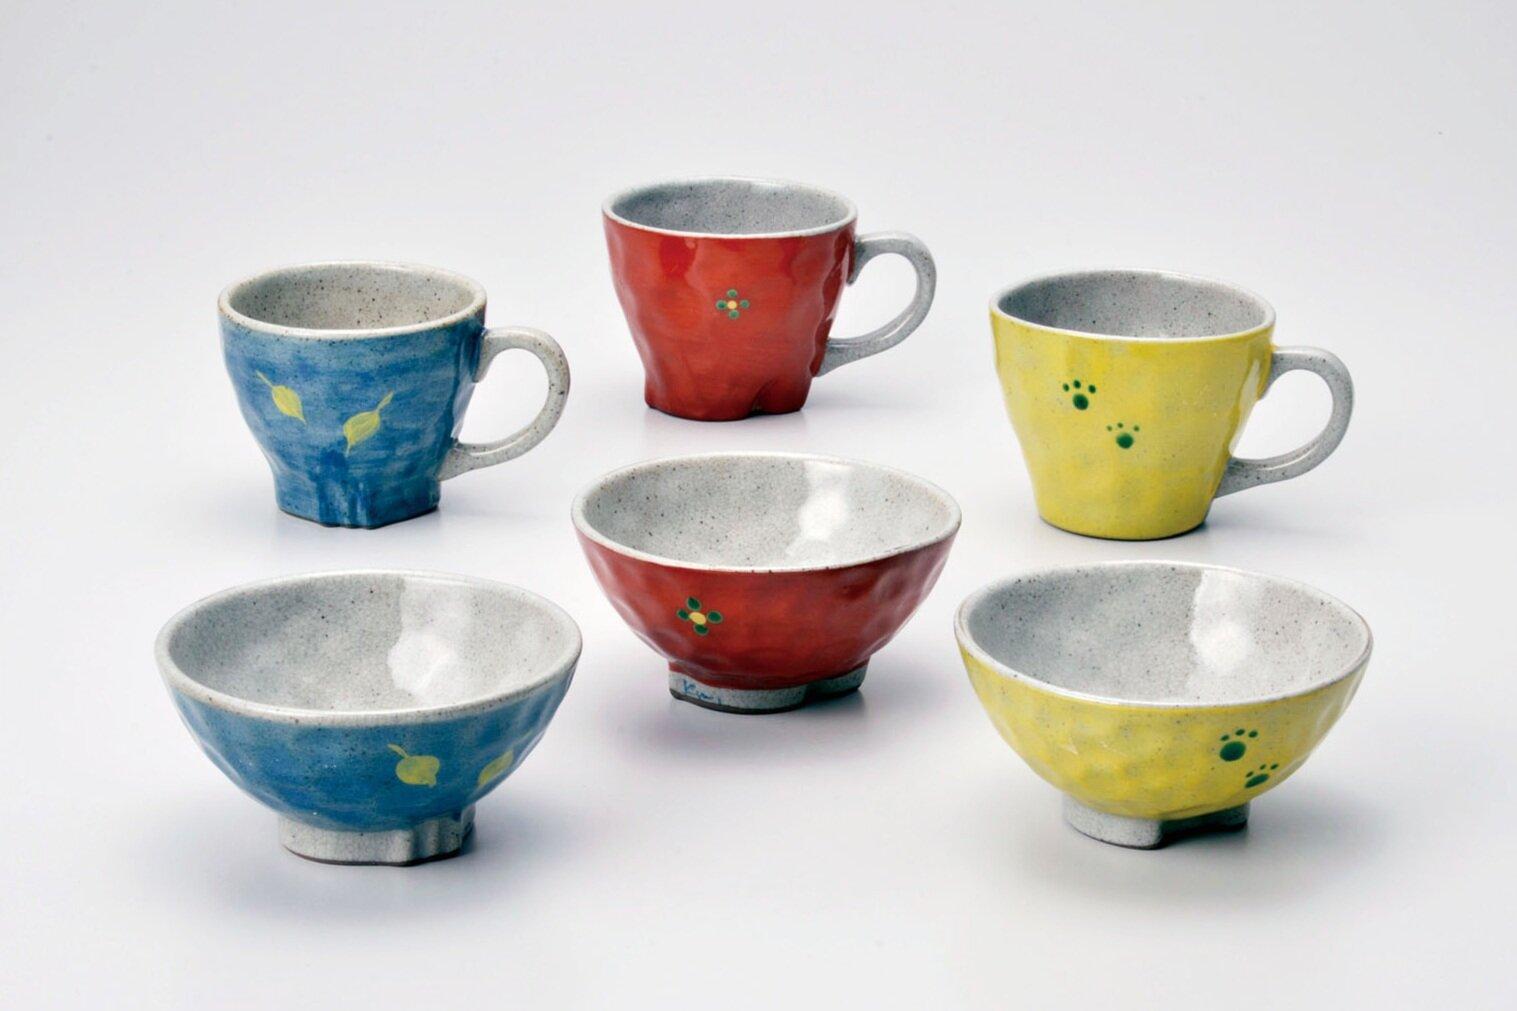 ARITA WARE - Mugs, Rice Bowls, Dishes, etc.